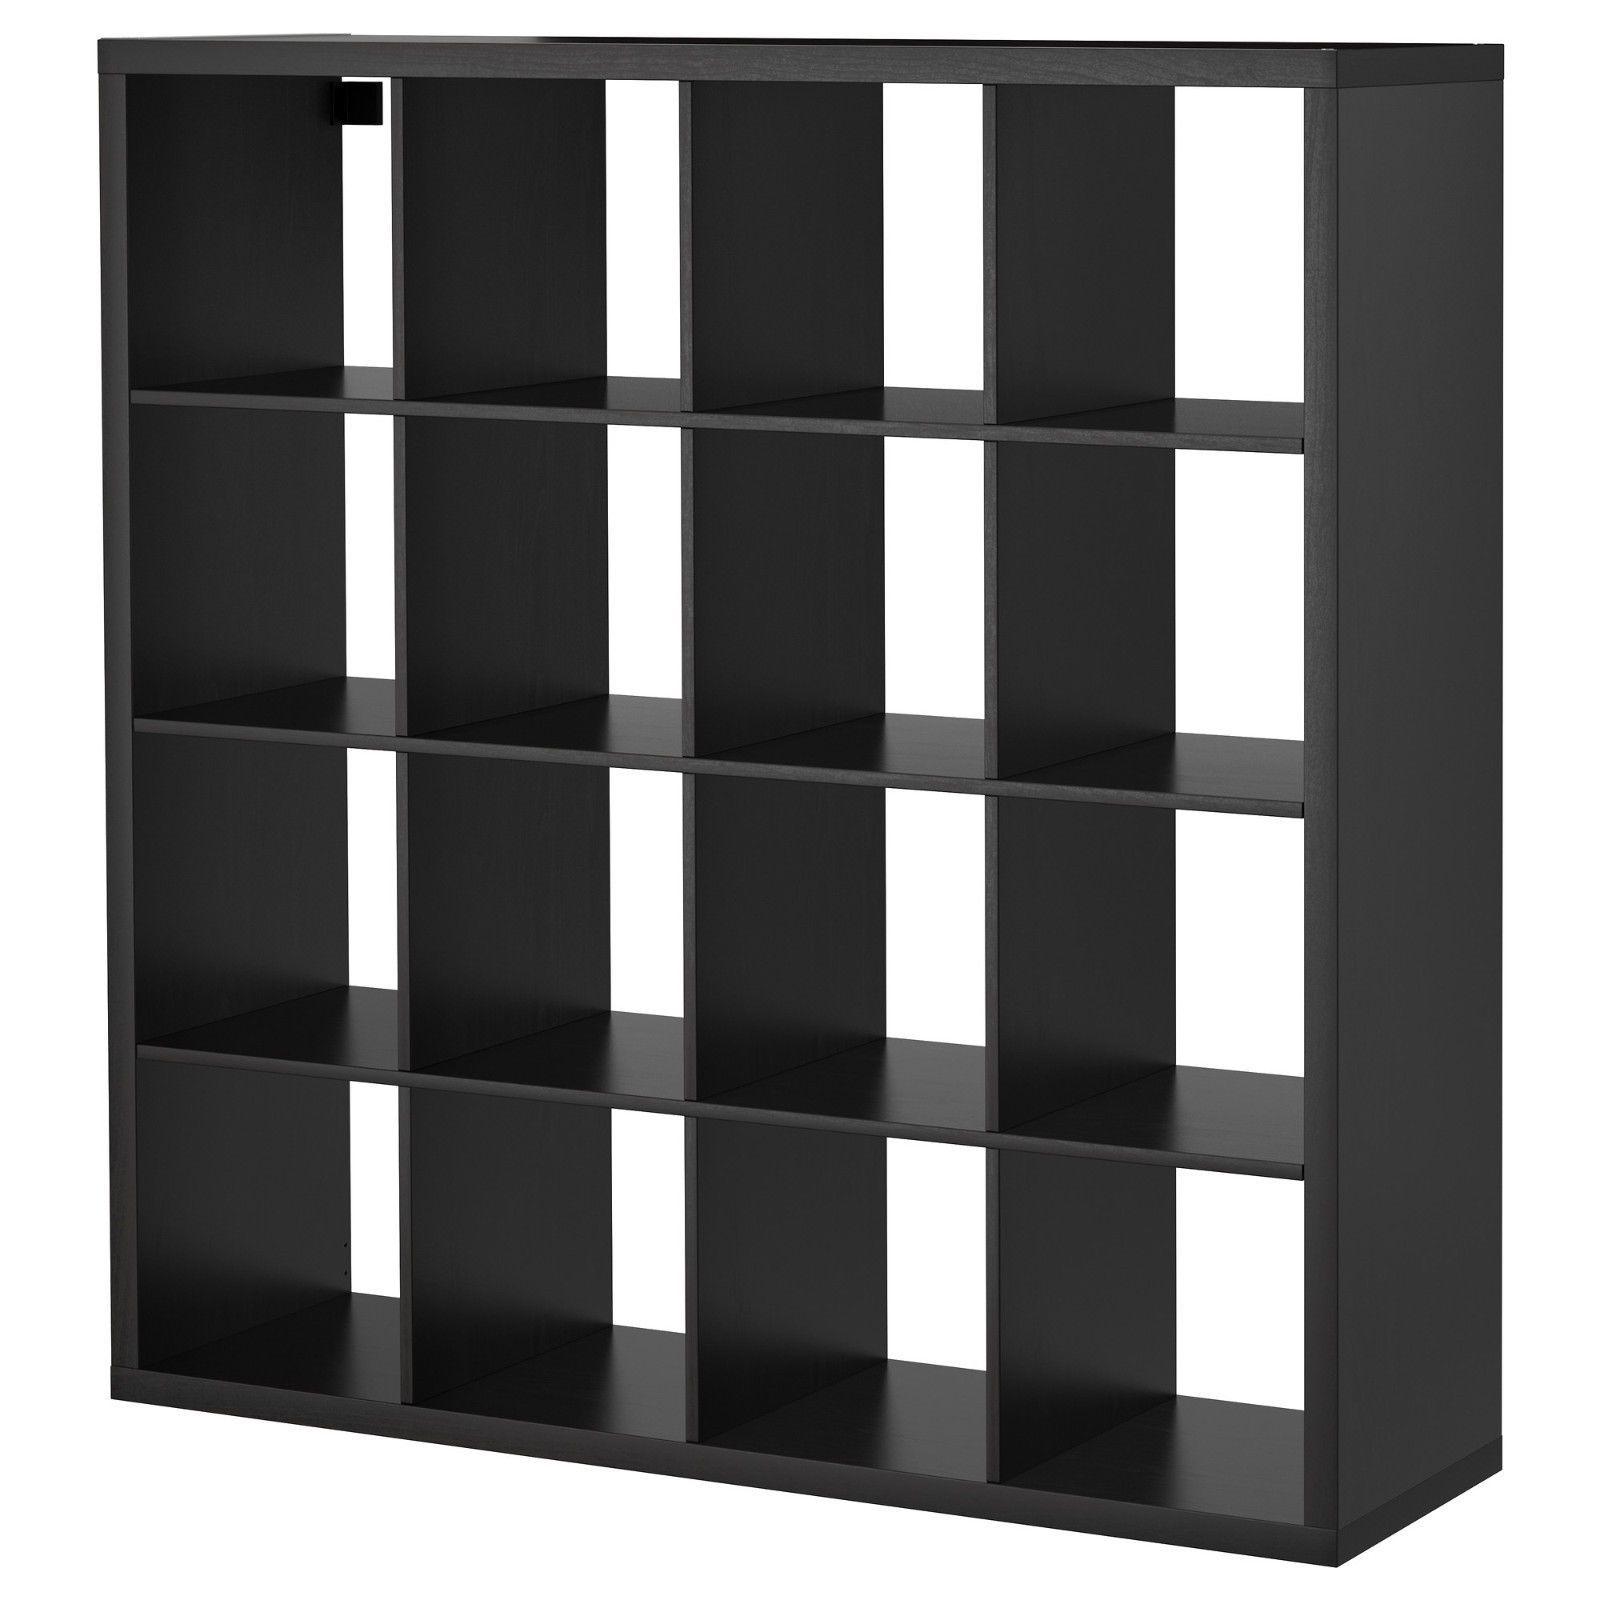 Ikea KALLAX 16 4x4 Shelf Shelving Unit Bookcase Storage Display Unit Rack Expedi https://t.co/u56JsbhfSS https://t.co/nIyVFBF4GK